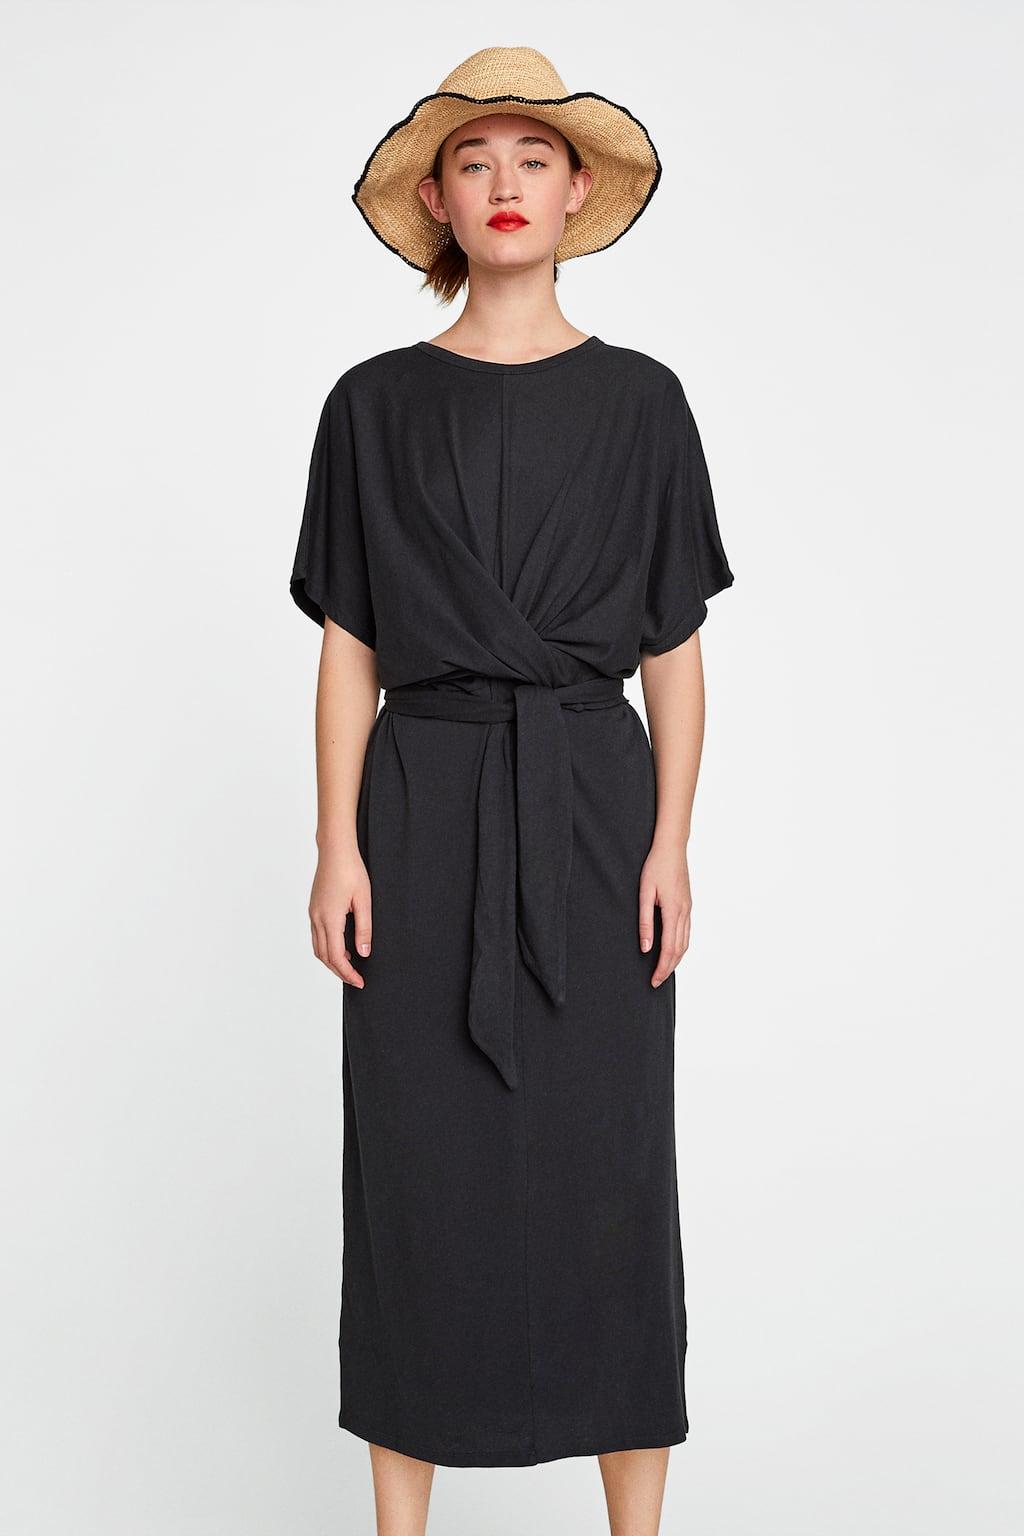 LONG DRESS WITH KNOT - DRESSES-SALE-WOMAN | ZARA United Kingdom